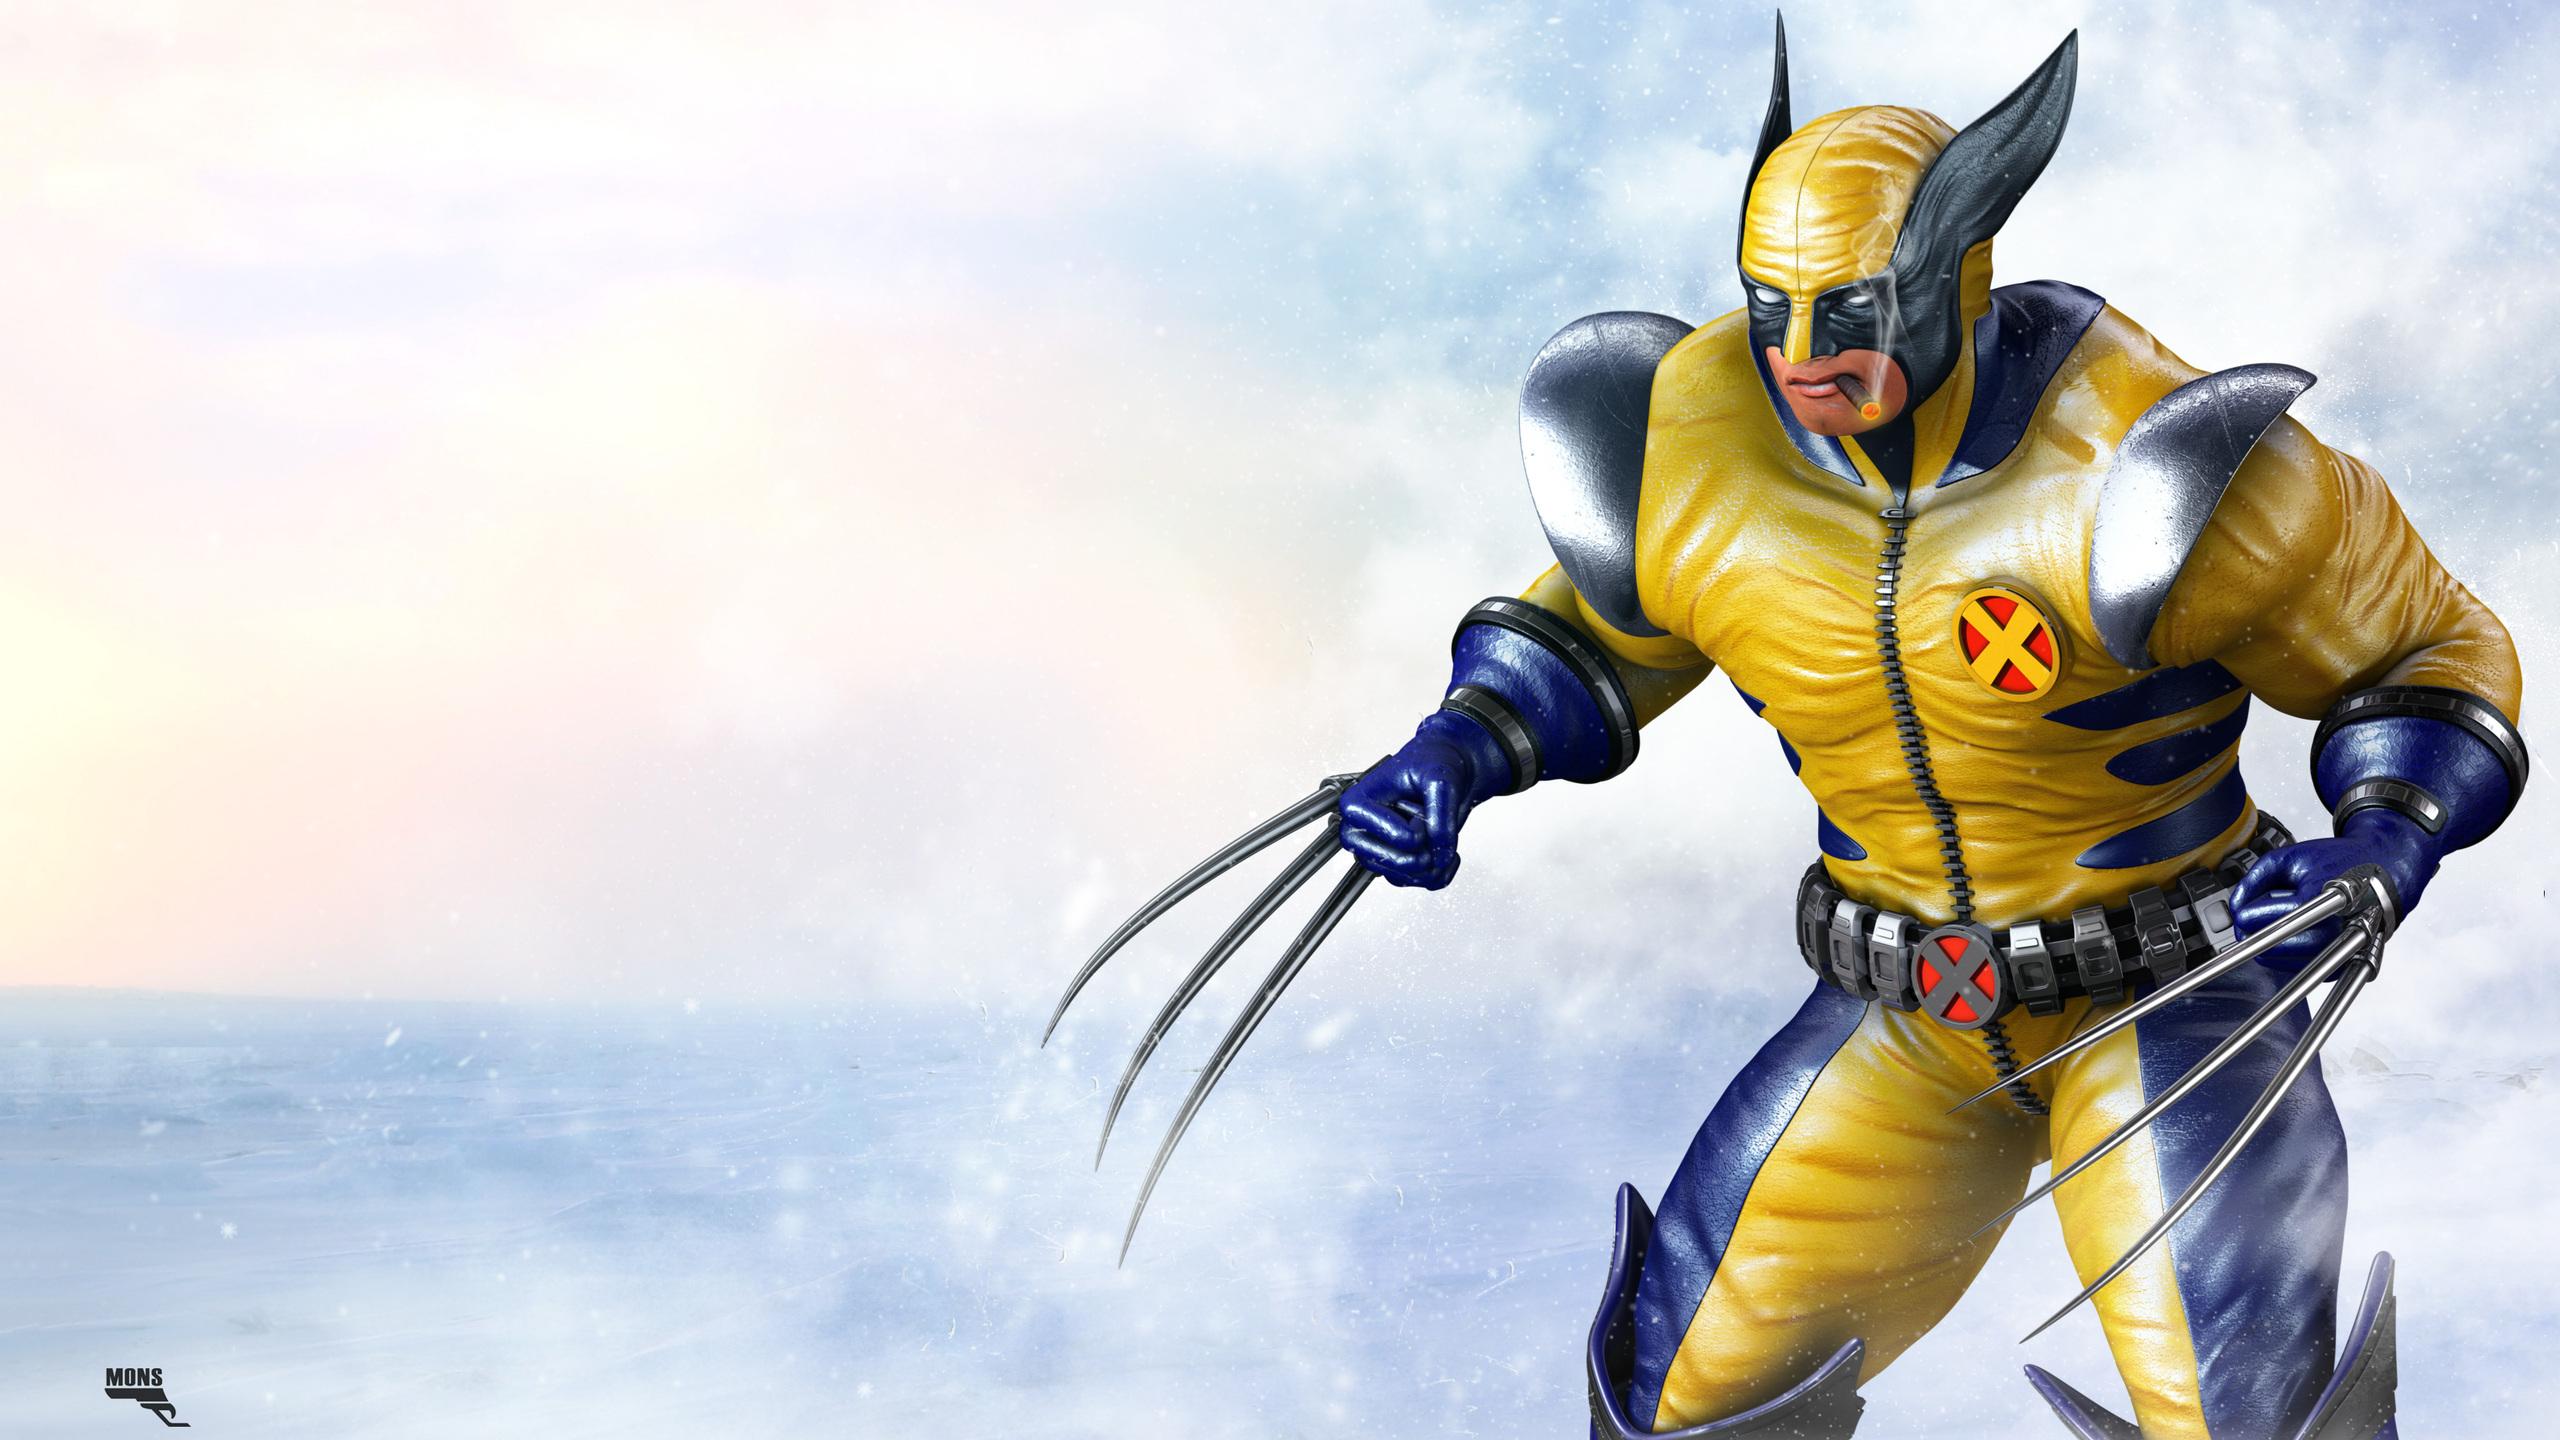 2560x1440 Wolverine 3d Cgi Artwork 1440p Resolution Hd 4k Wallpapers